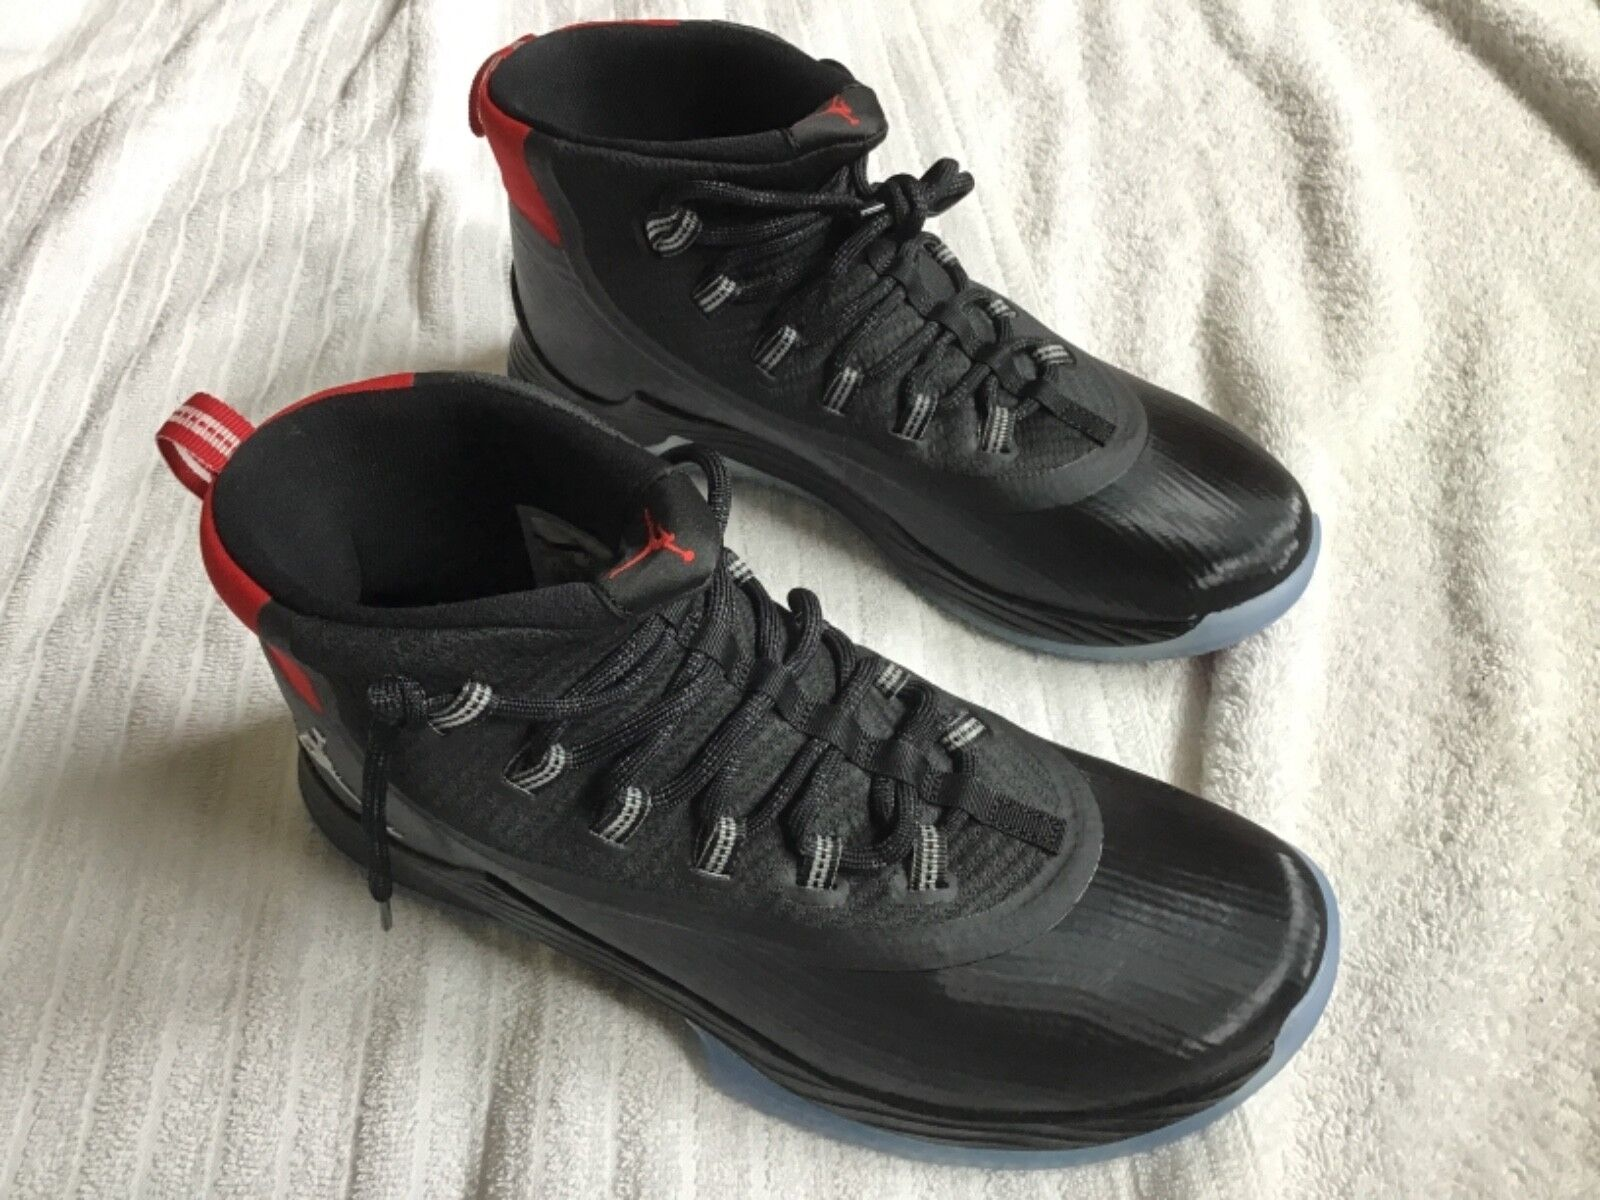 Nike Jordan Men's Ultra Fly 2 Basketball Shoe Black 897998_003 size 11